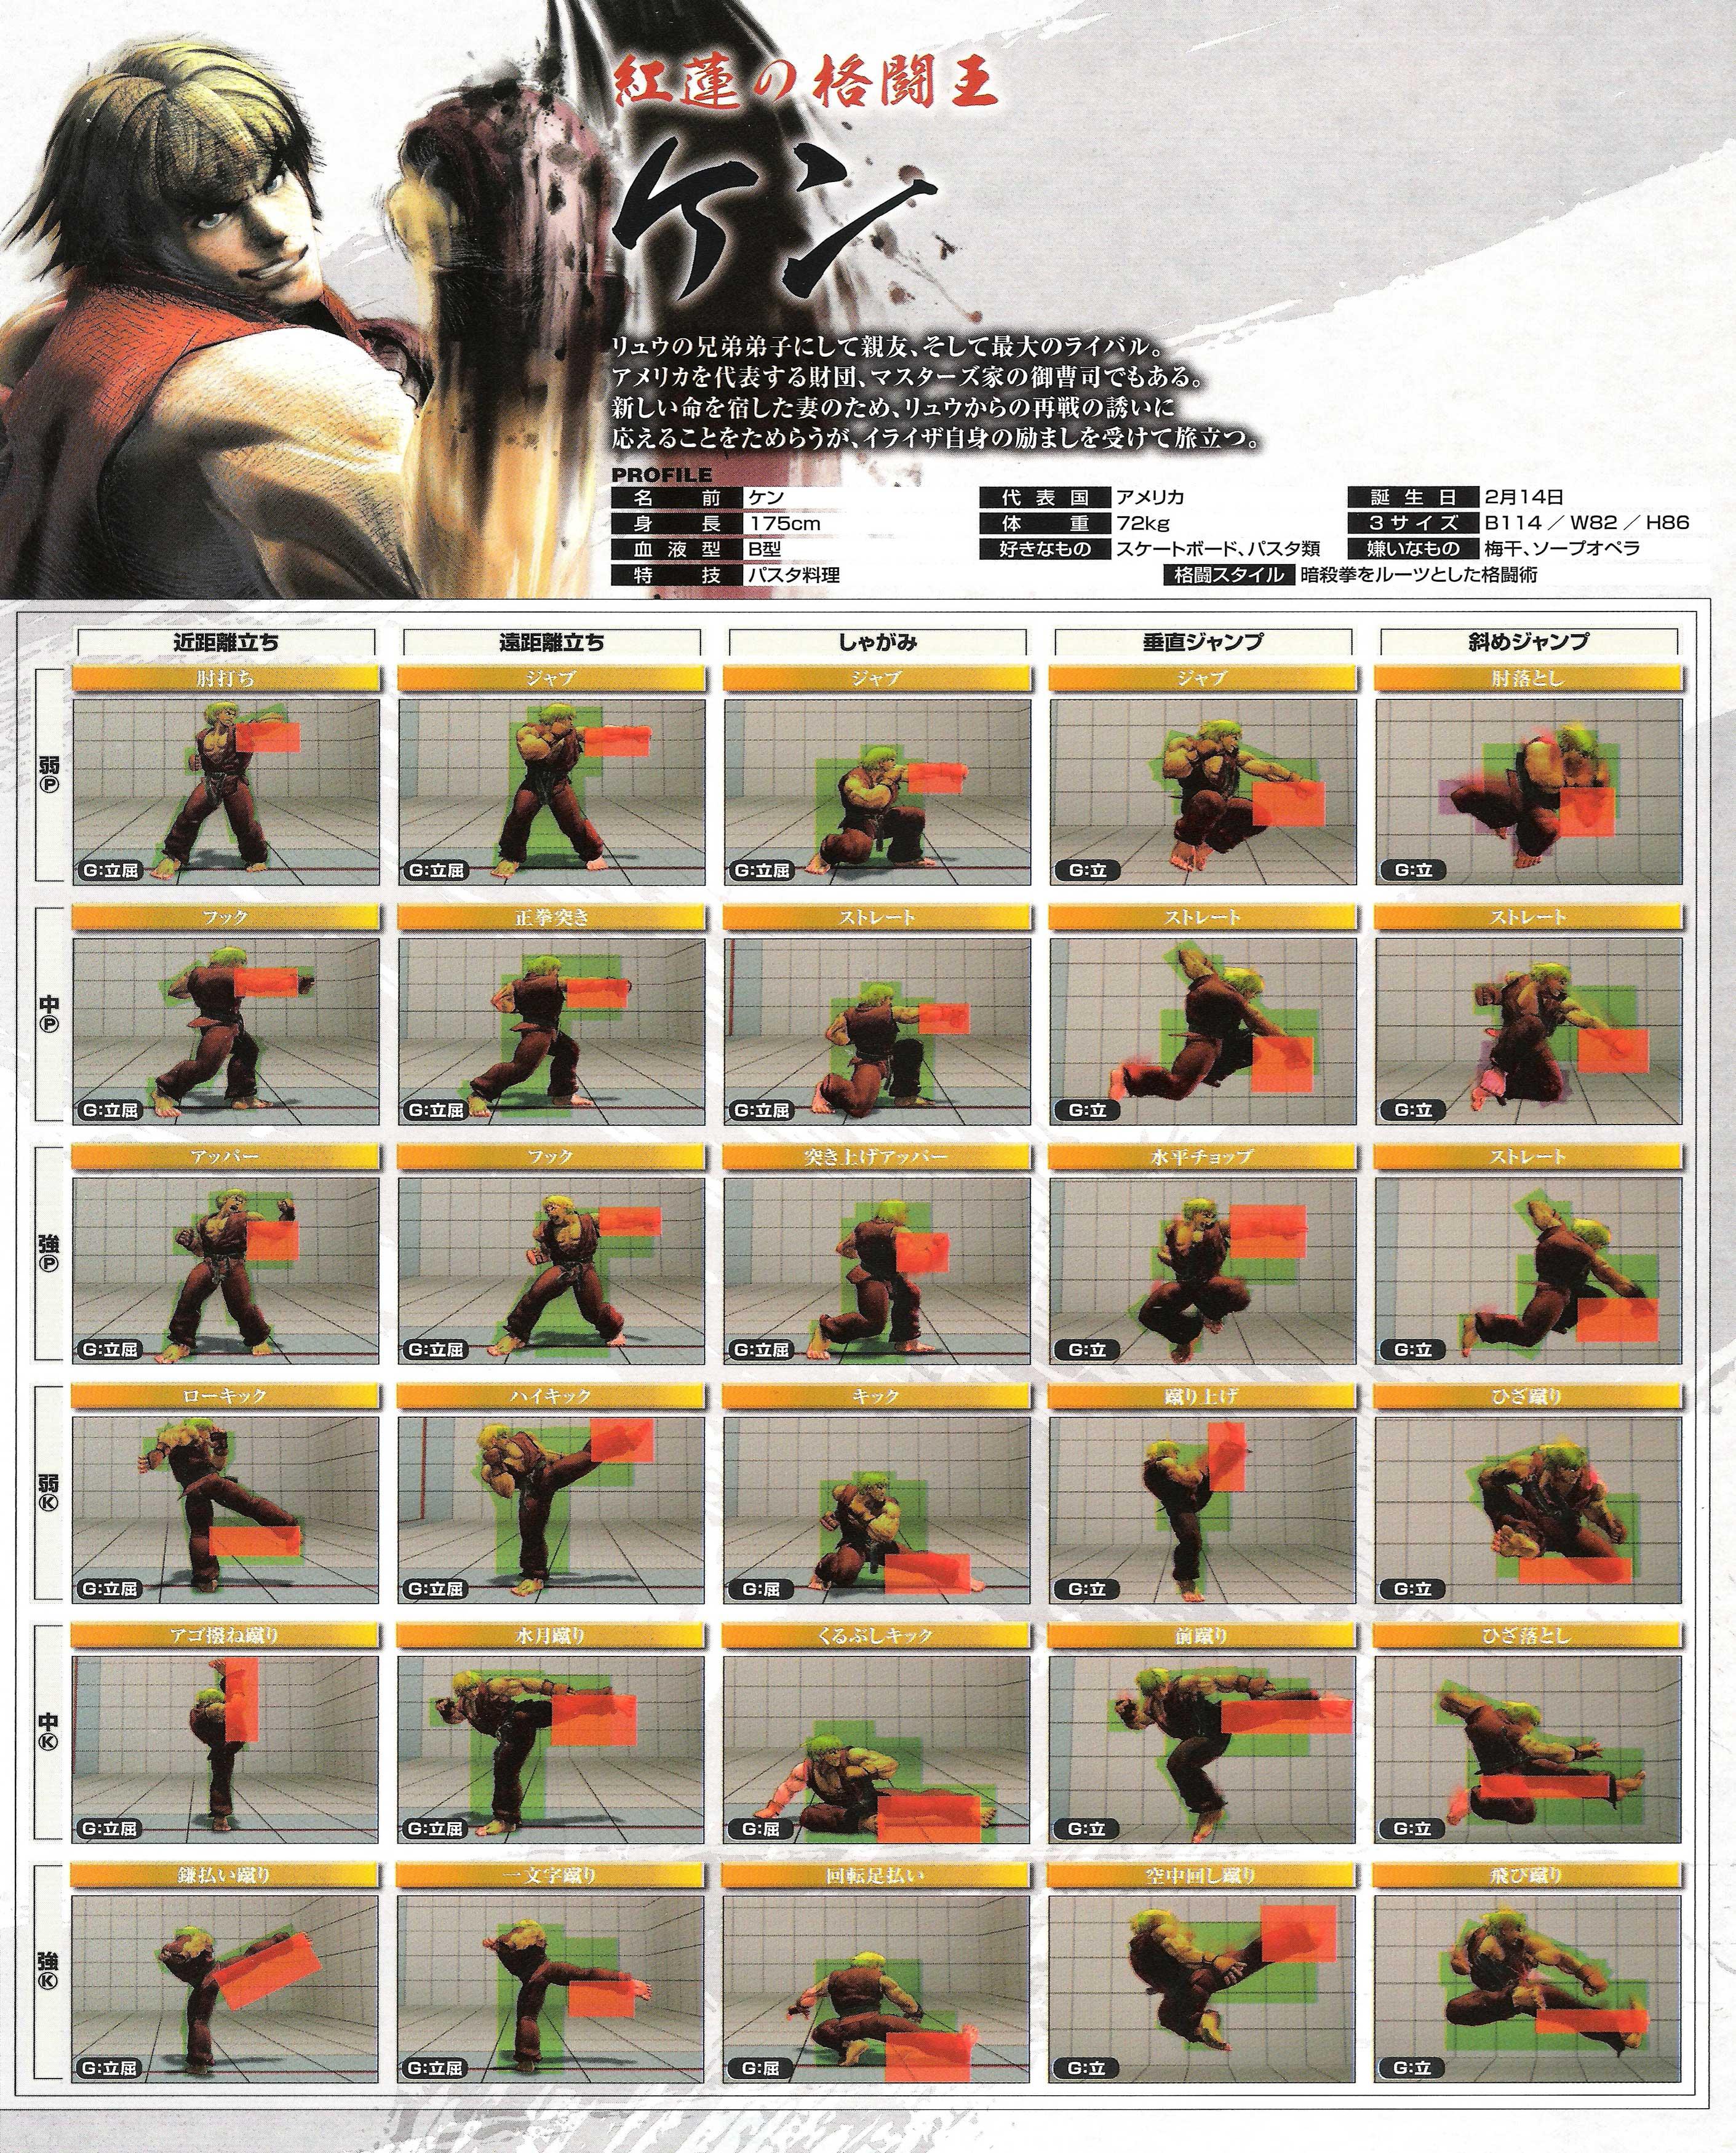 Ken's hit box information for Super Street Fighter 4 Arcade Edition image #1